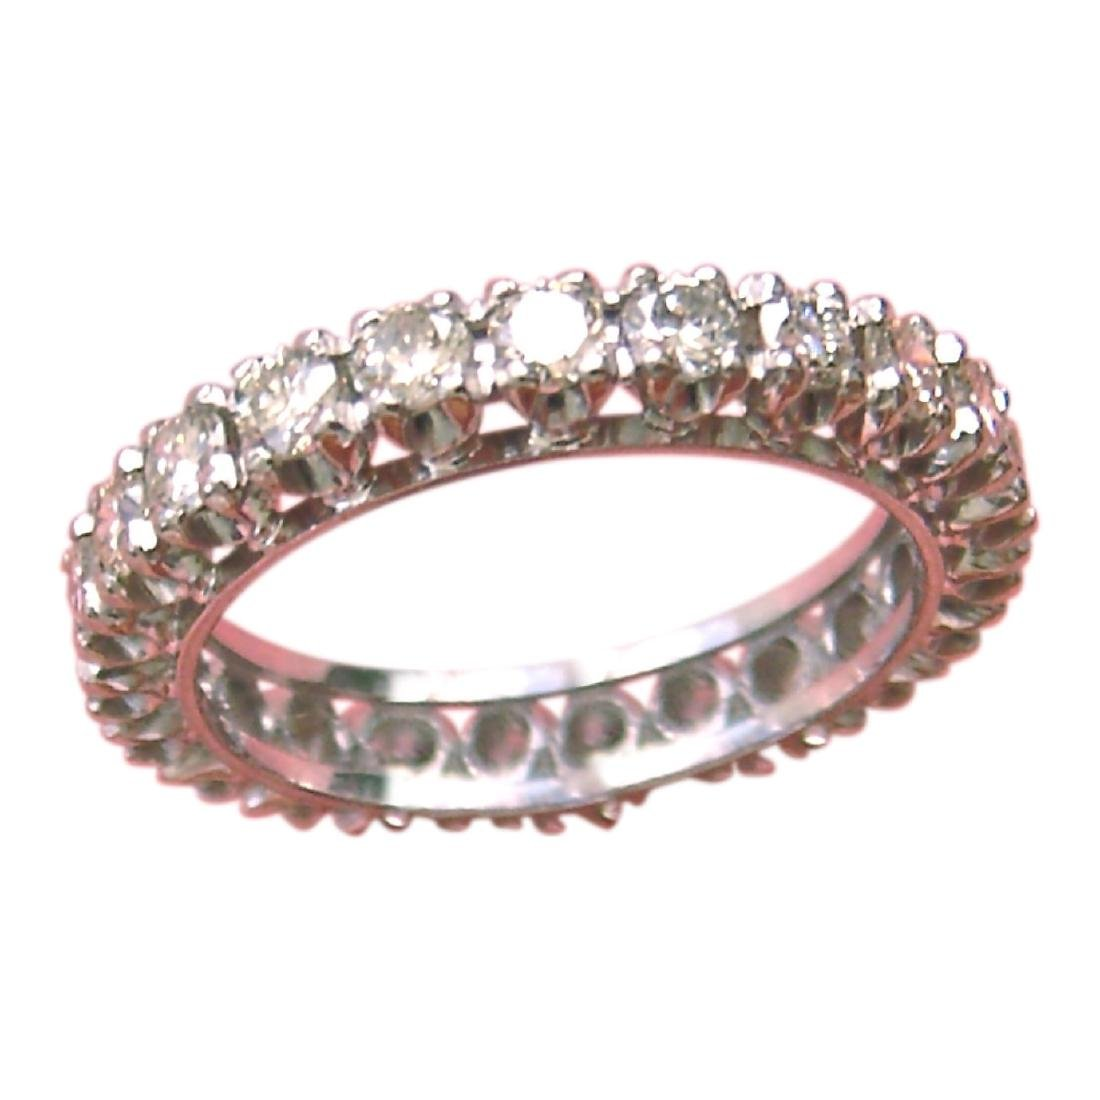 Vintage 18K Gold Diamond Eternity Band Ring, 1960